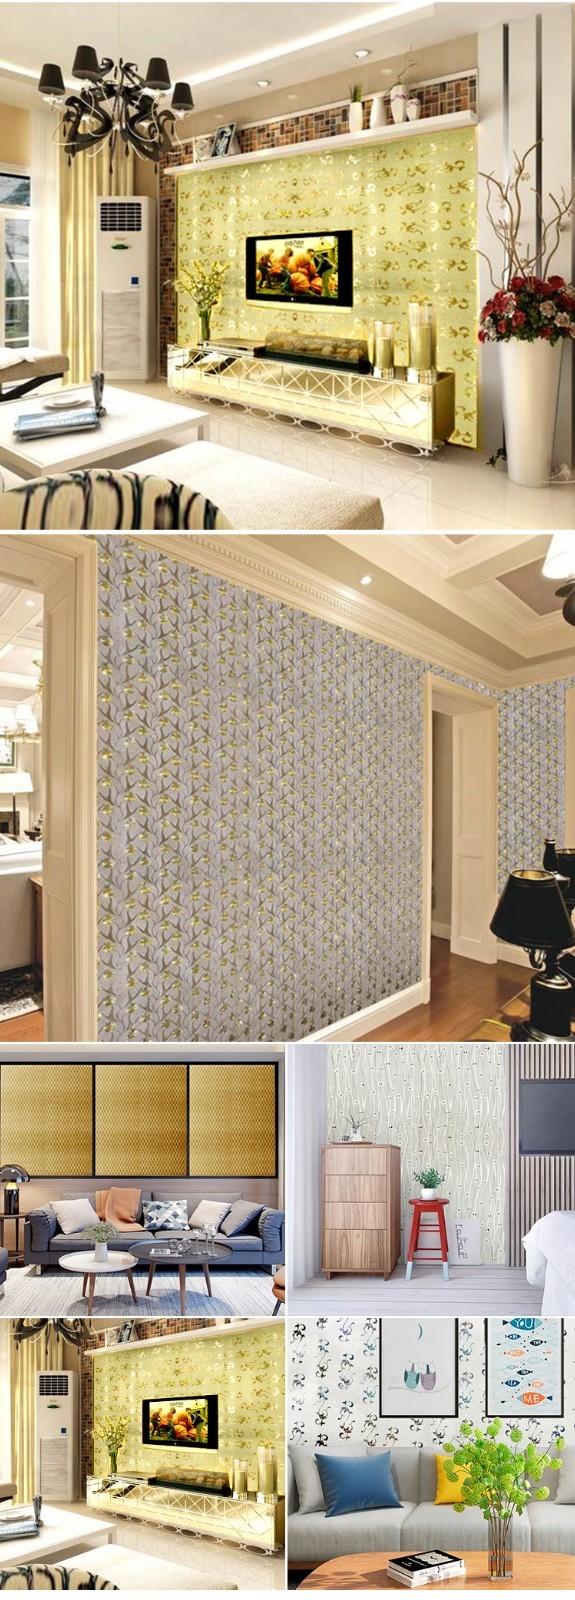 SUNYE kitchen wall backsplash series for sale